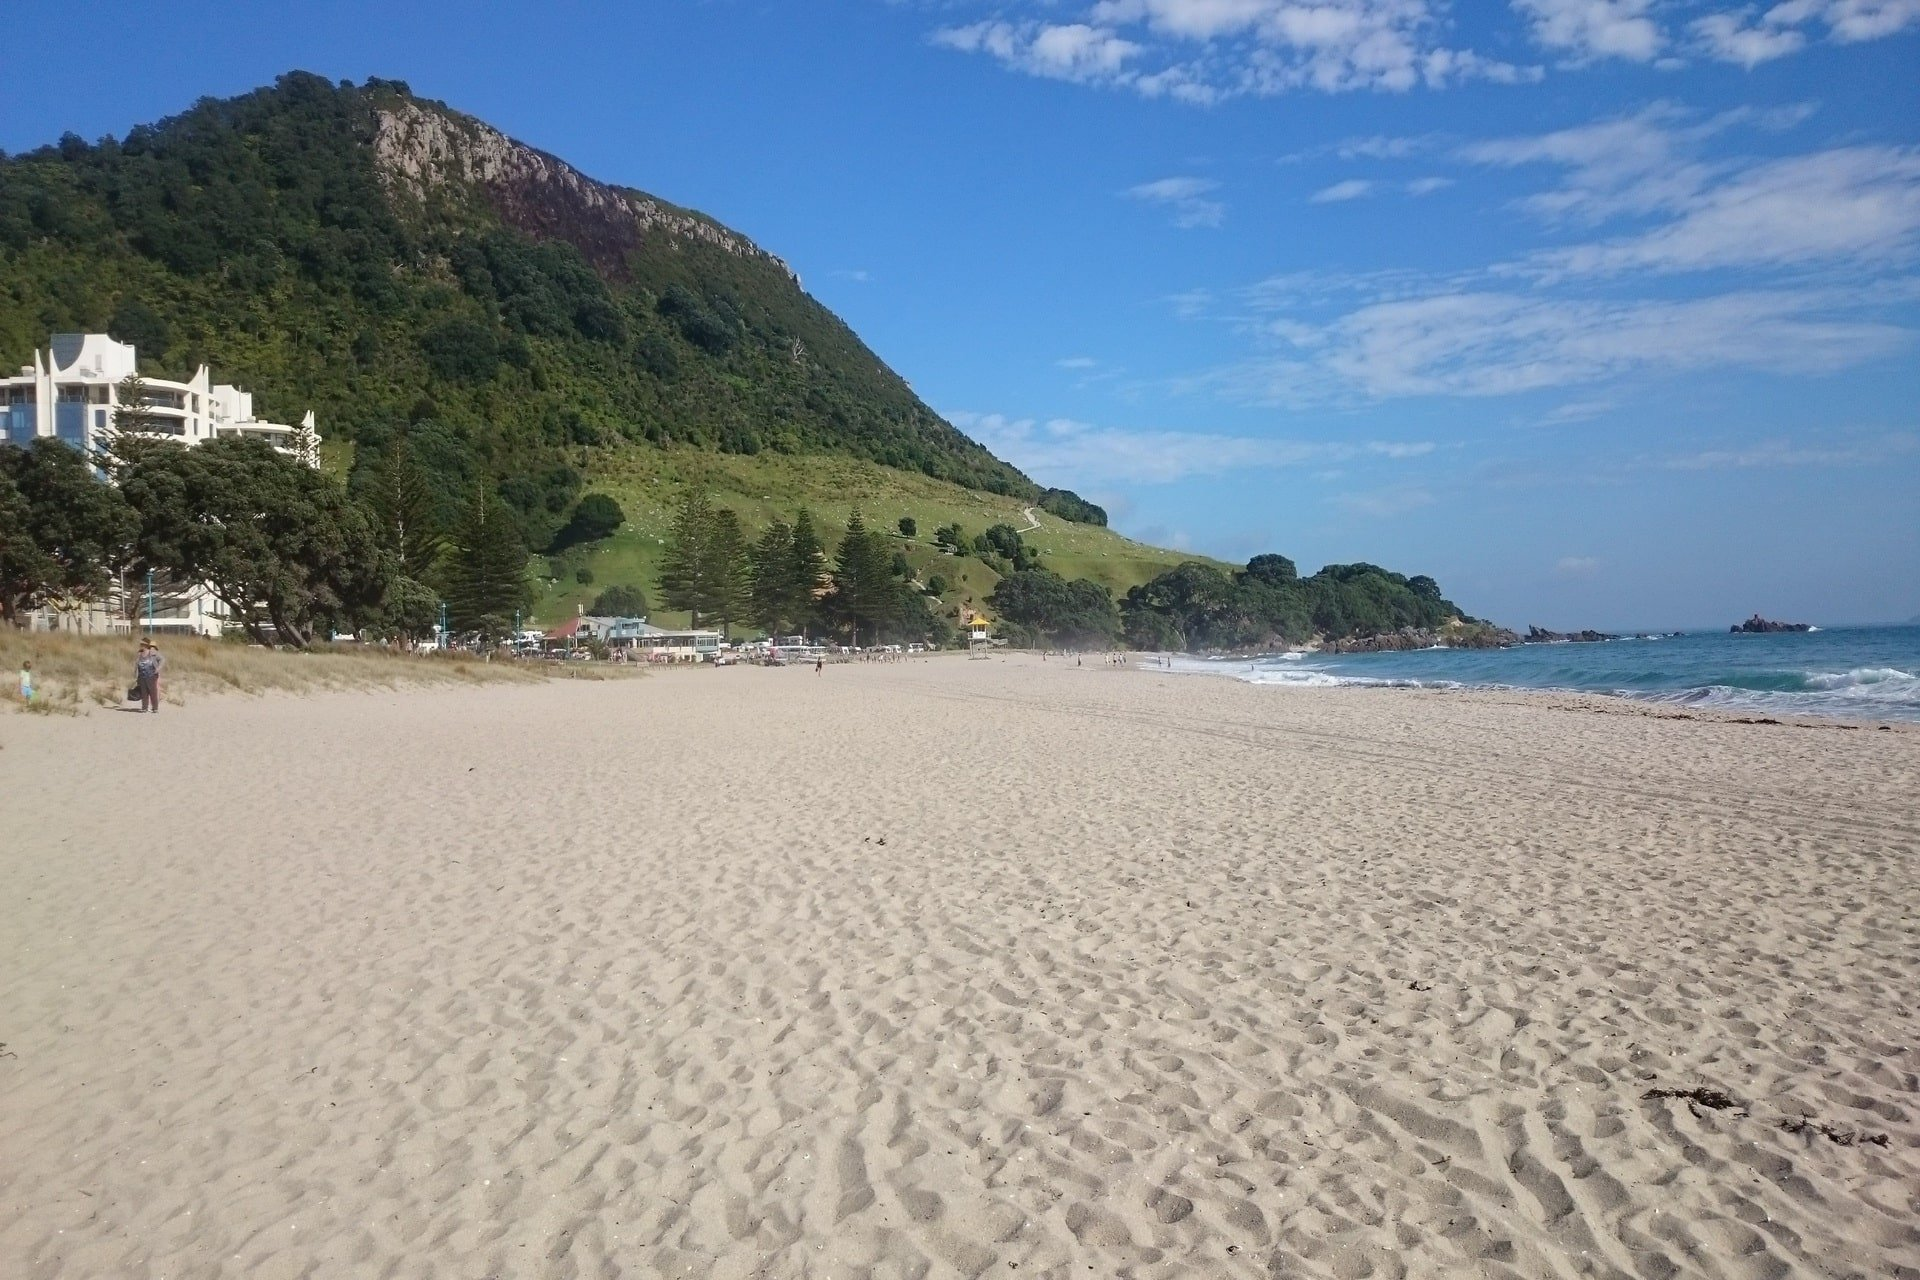 Mount-maunganui-beach